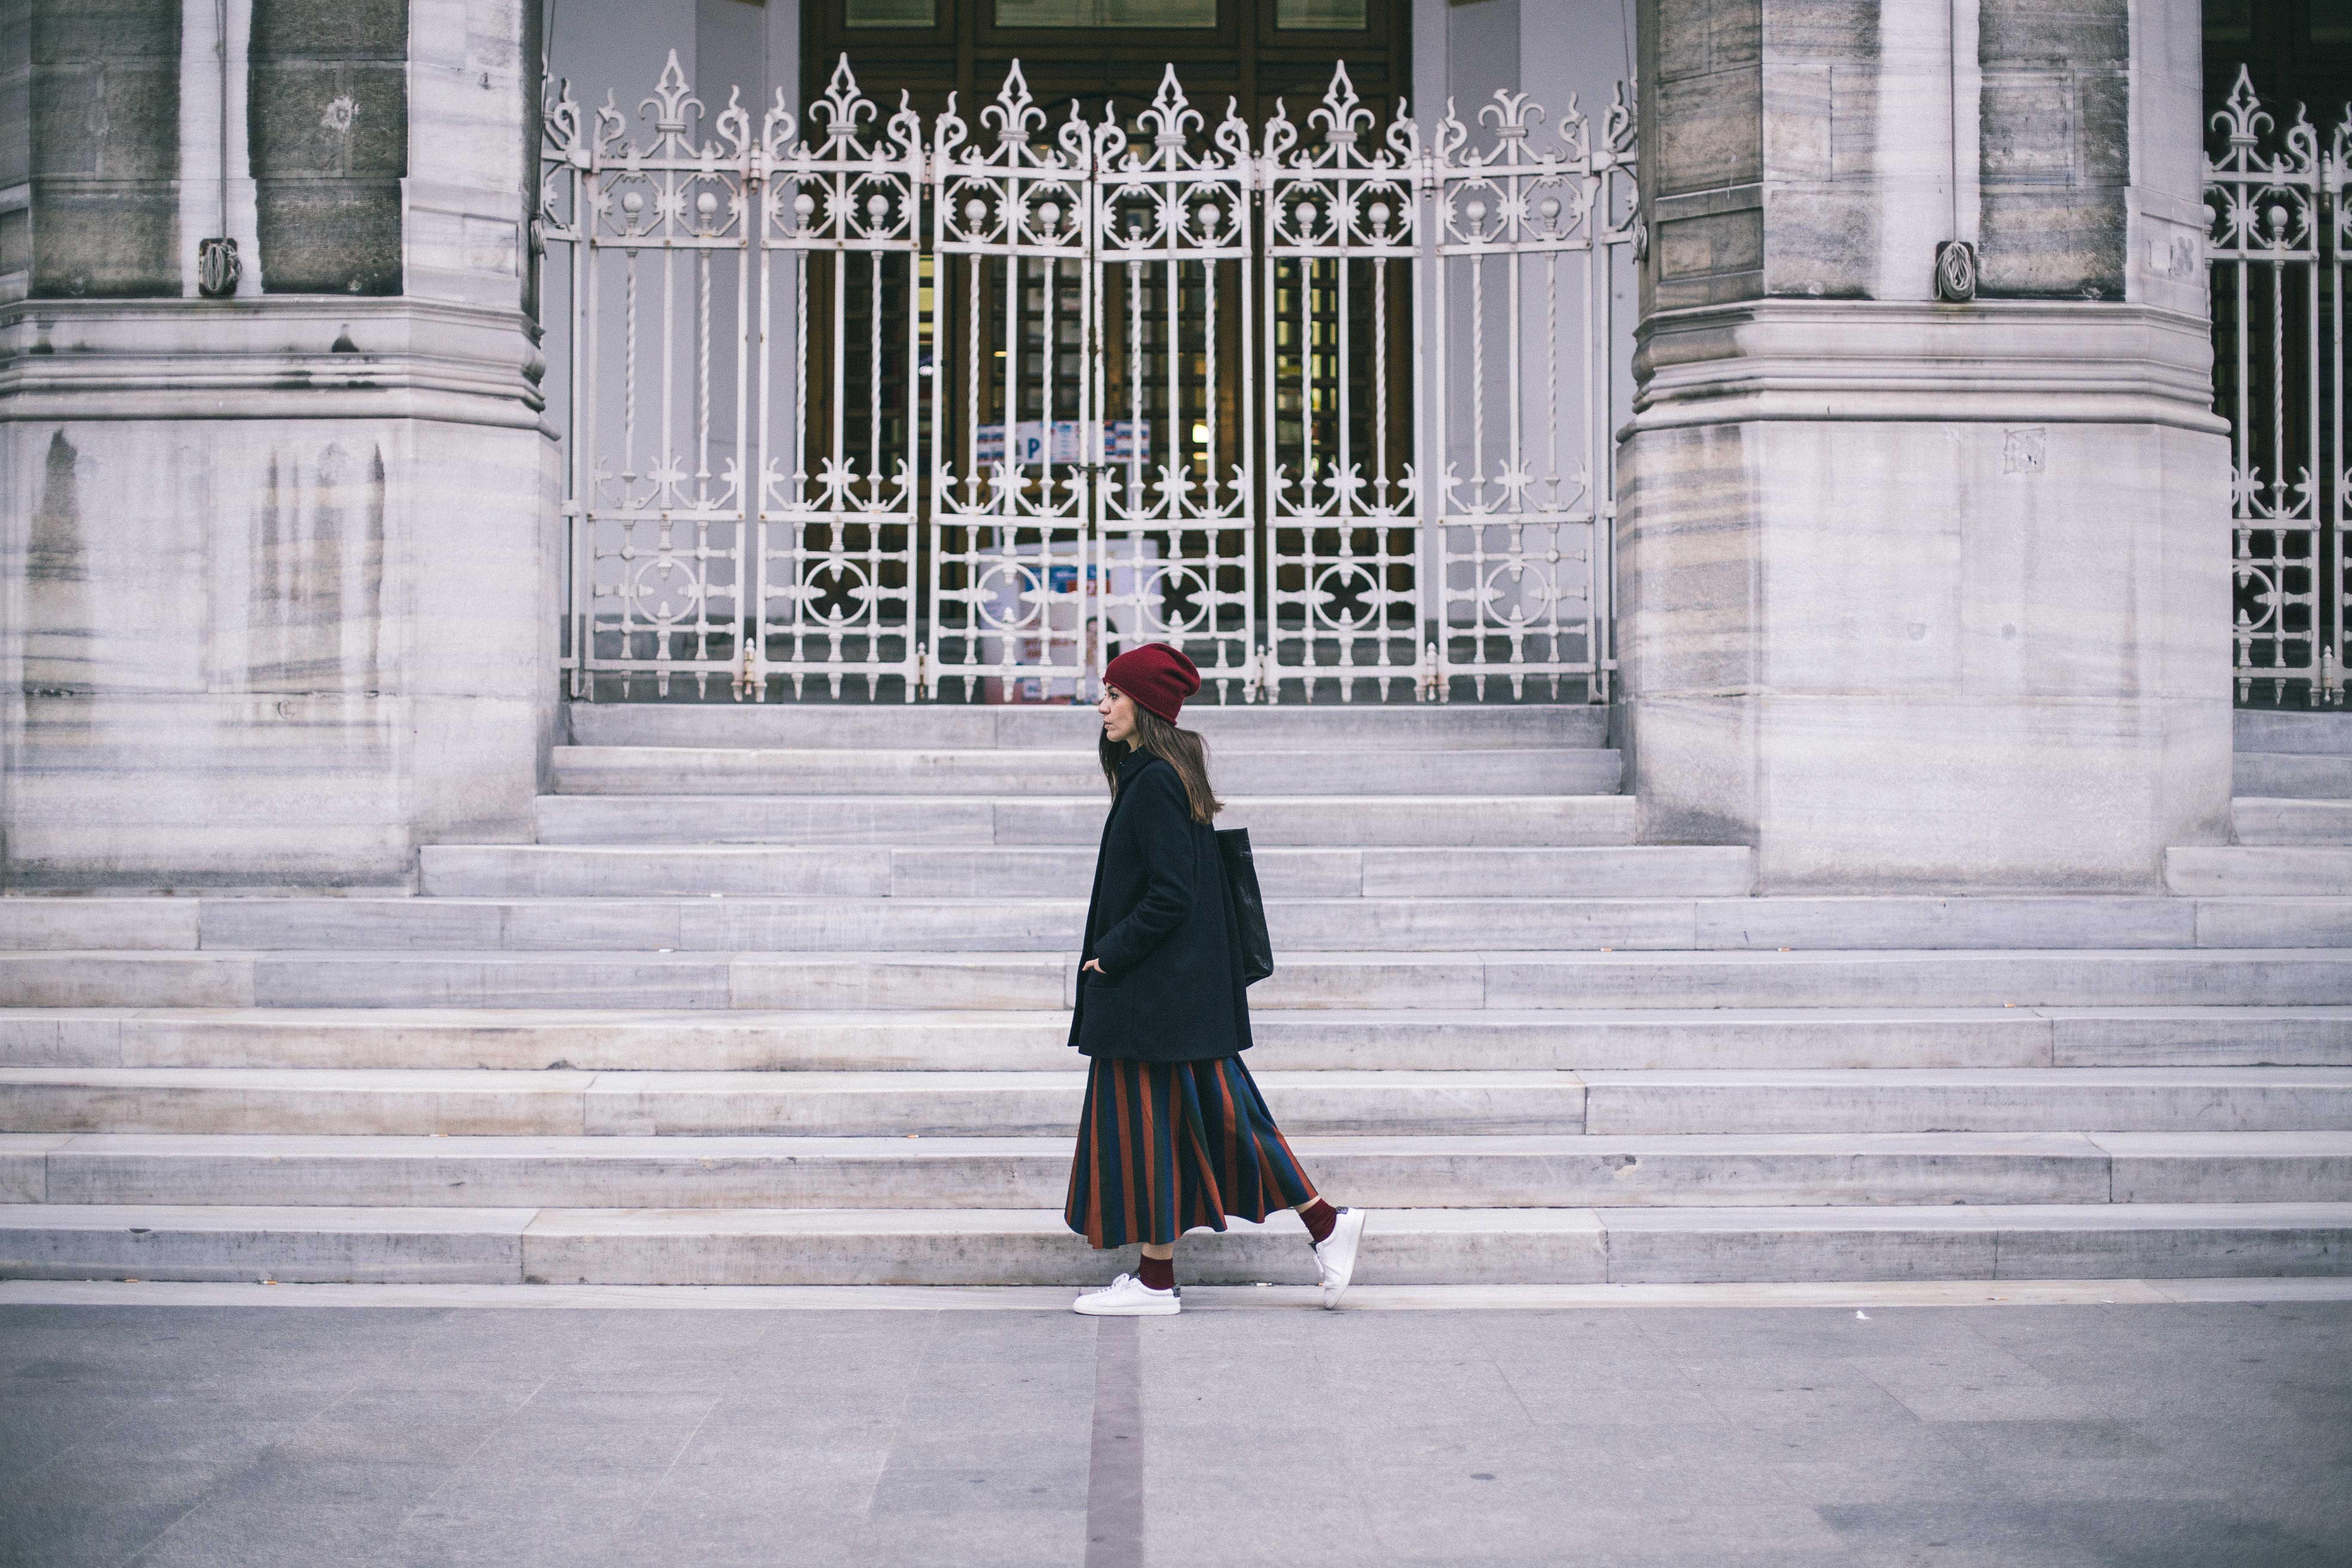 billur saatci, offnegiysem, turkish style blogger, street style, fashion, ootd, blogger, istanbul, mehtap elaidi, cos, eminönü, zespa aix-en-provence